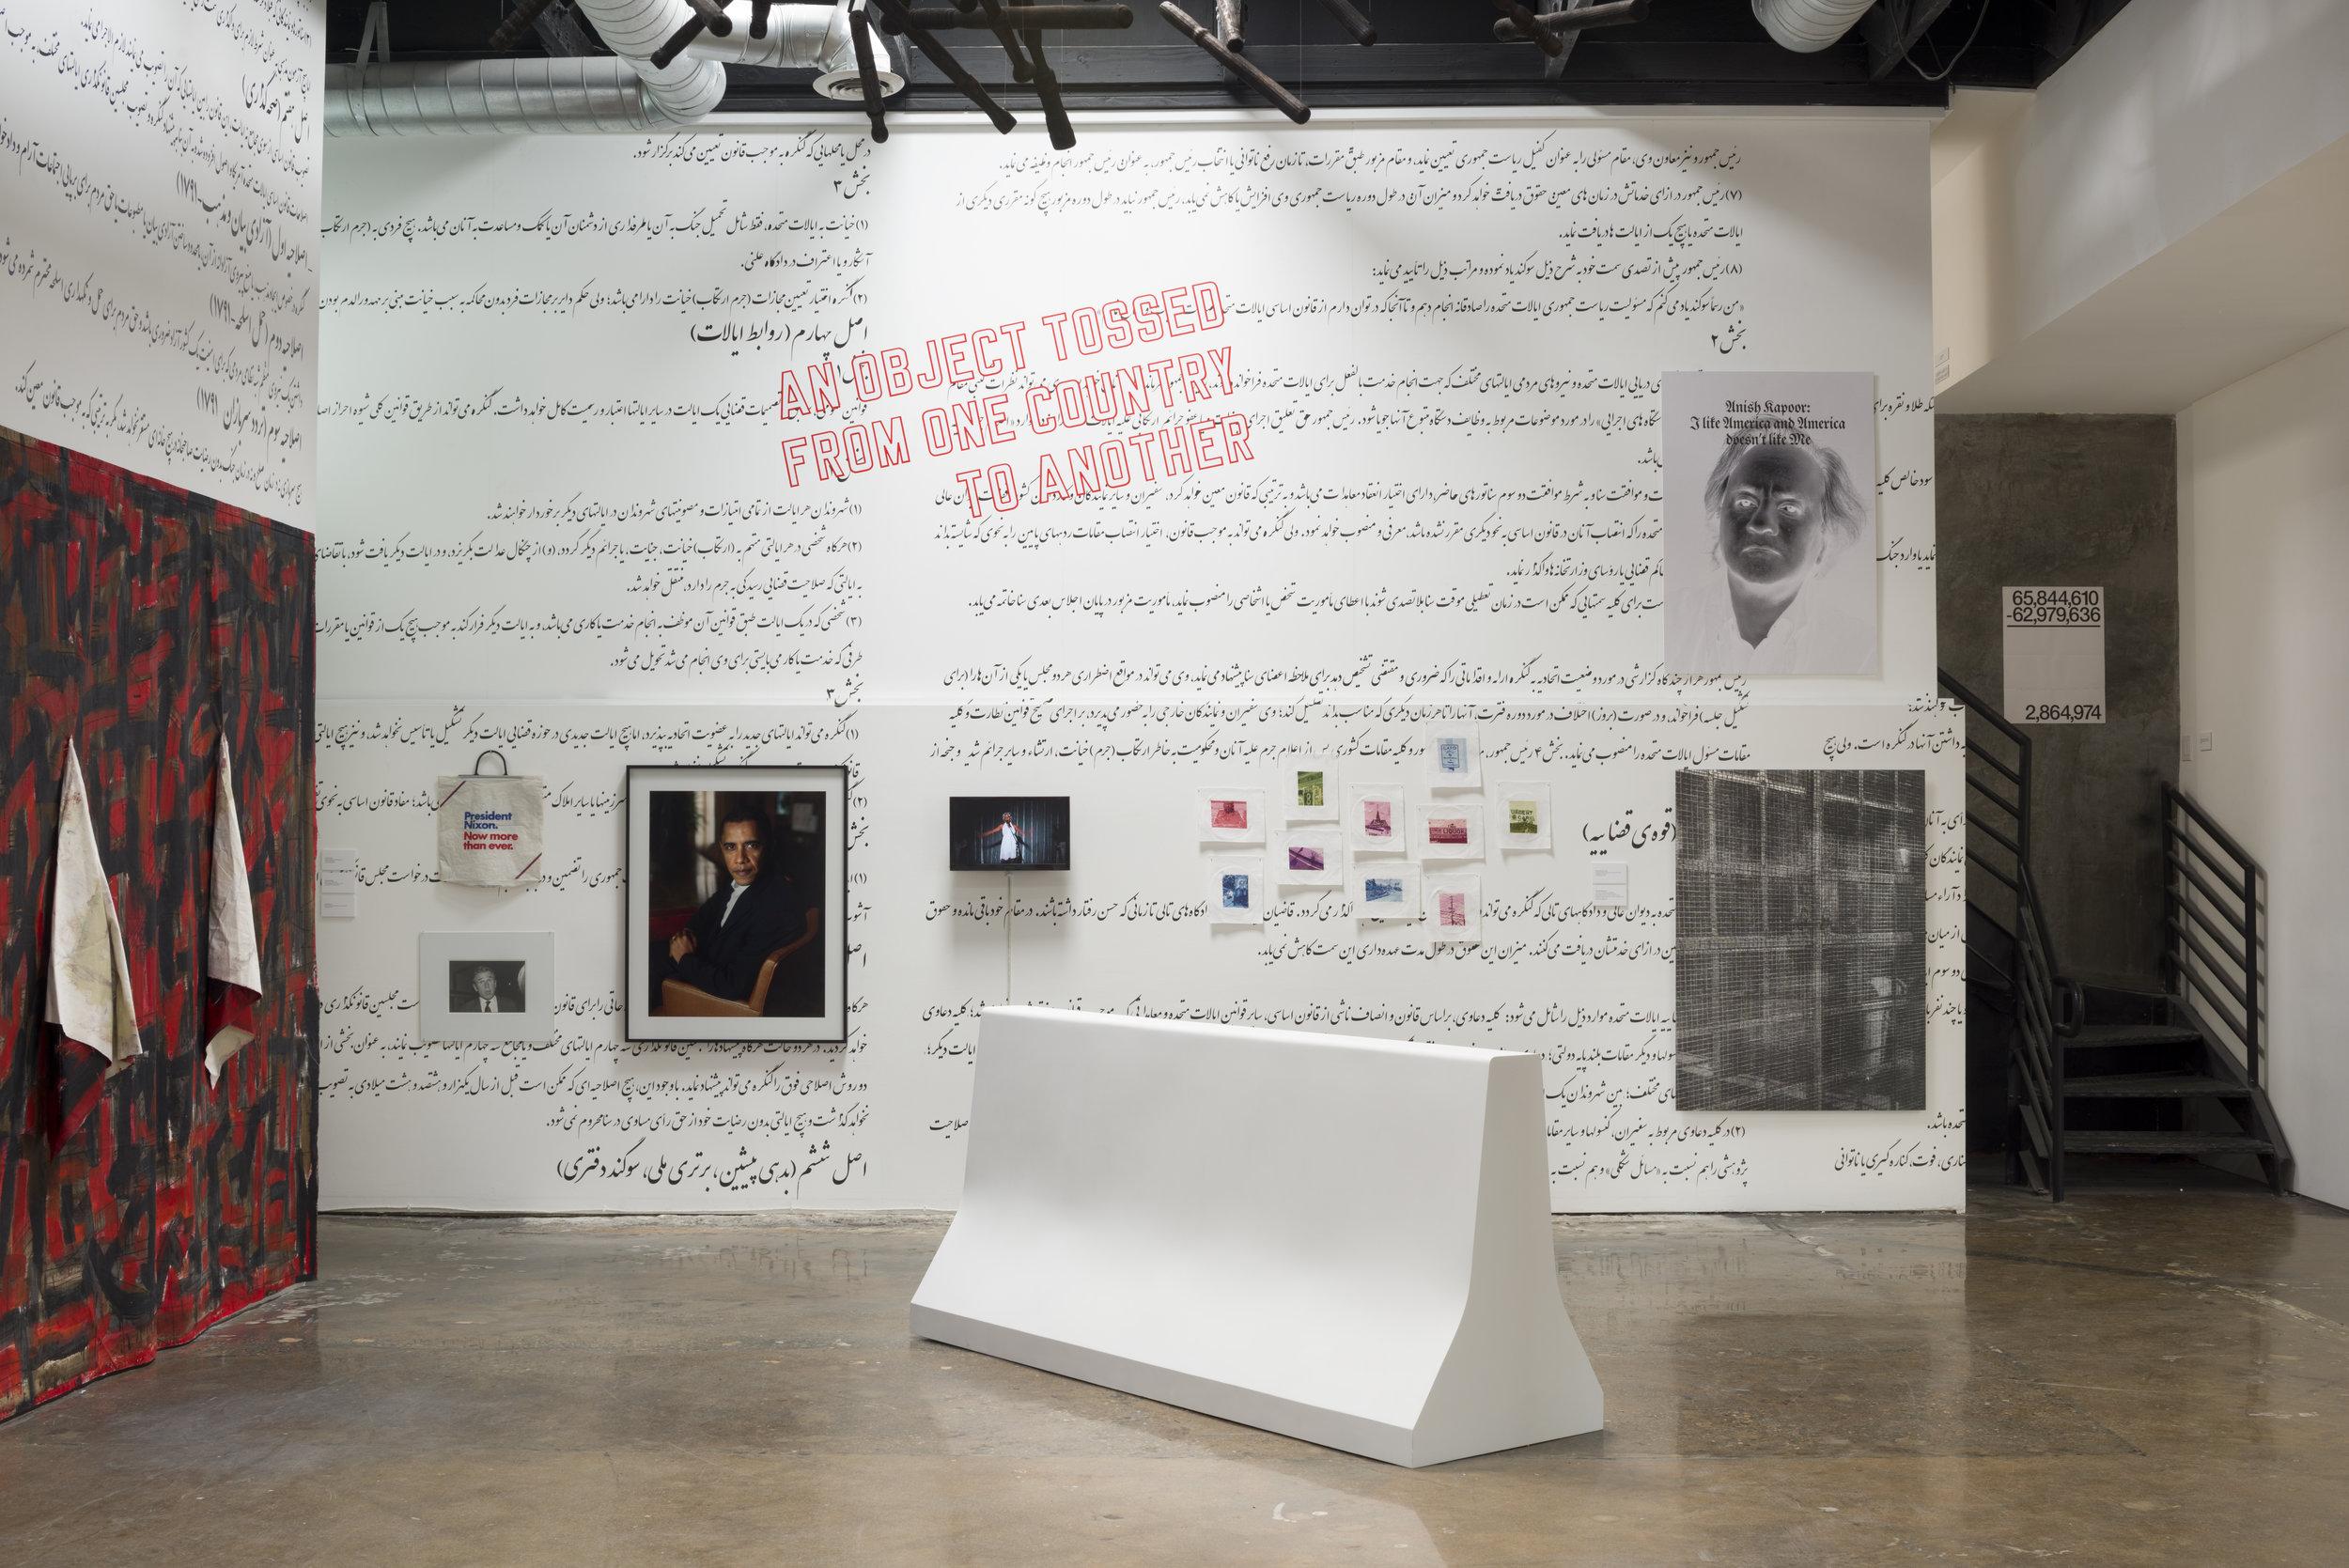 Installation View (Lawrence Weiner, Jeoff Davis, Arshia Haq, Harold Mendez, Lauren Davis Fisher, Anish Kapoor).jpg